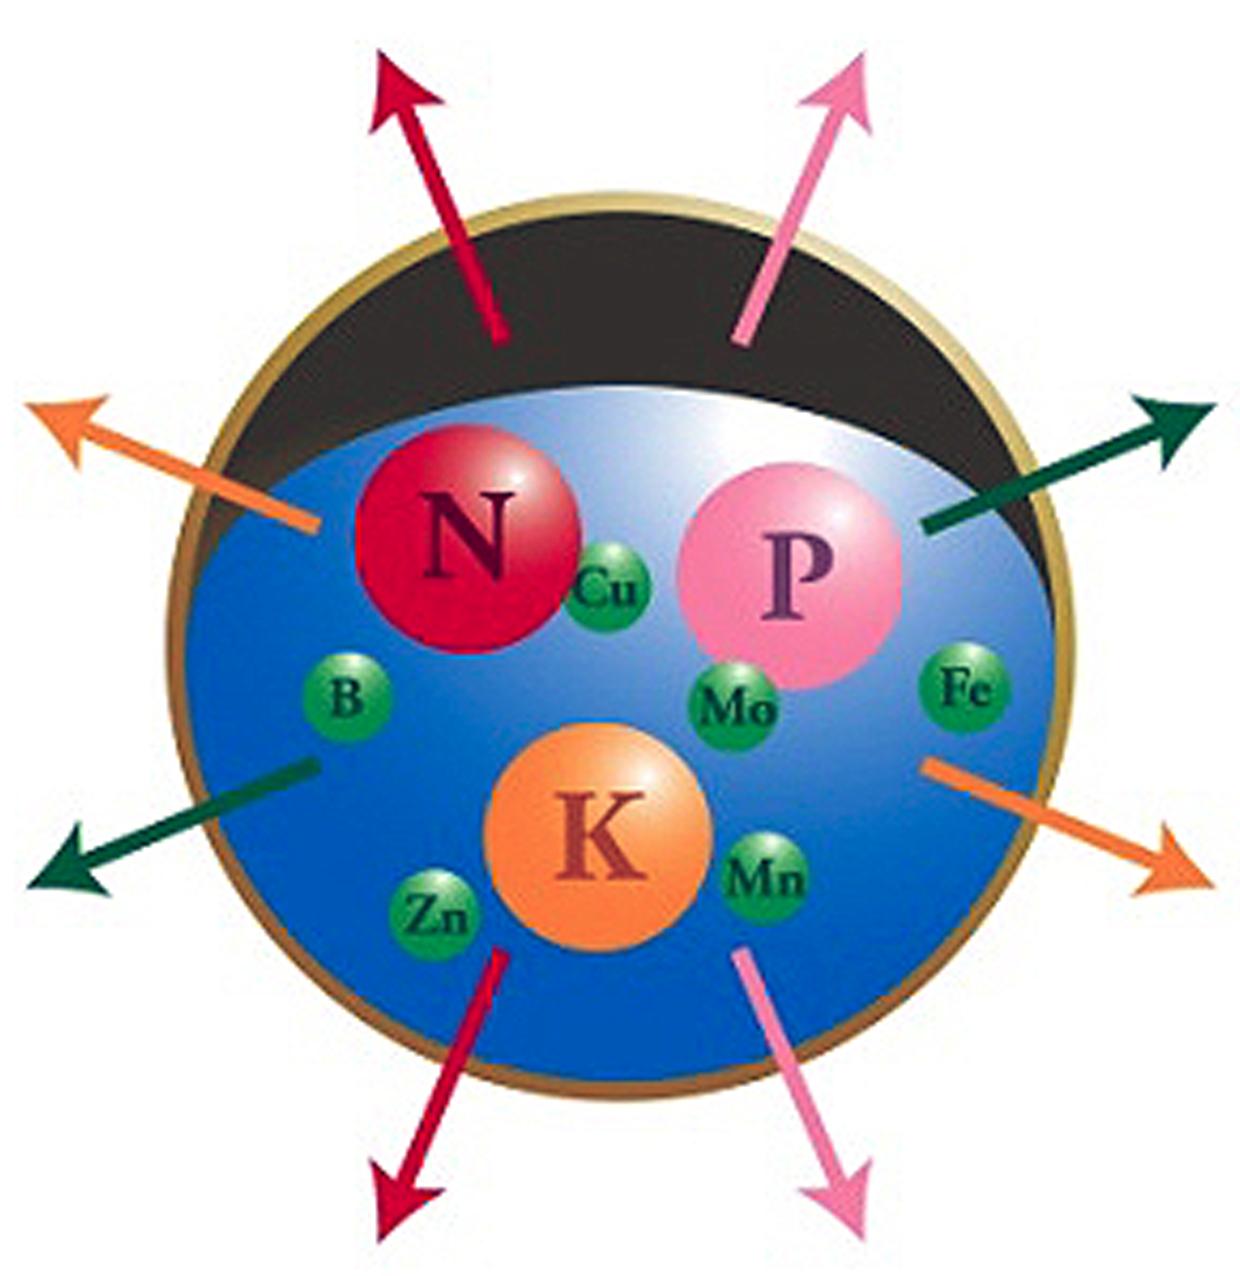 npk-skitbild